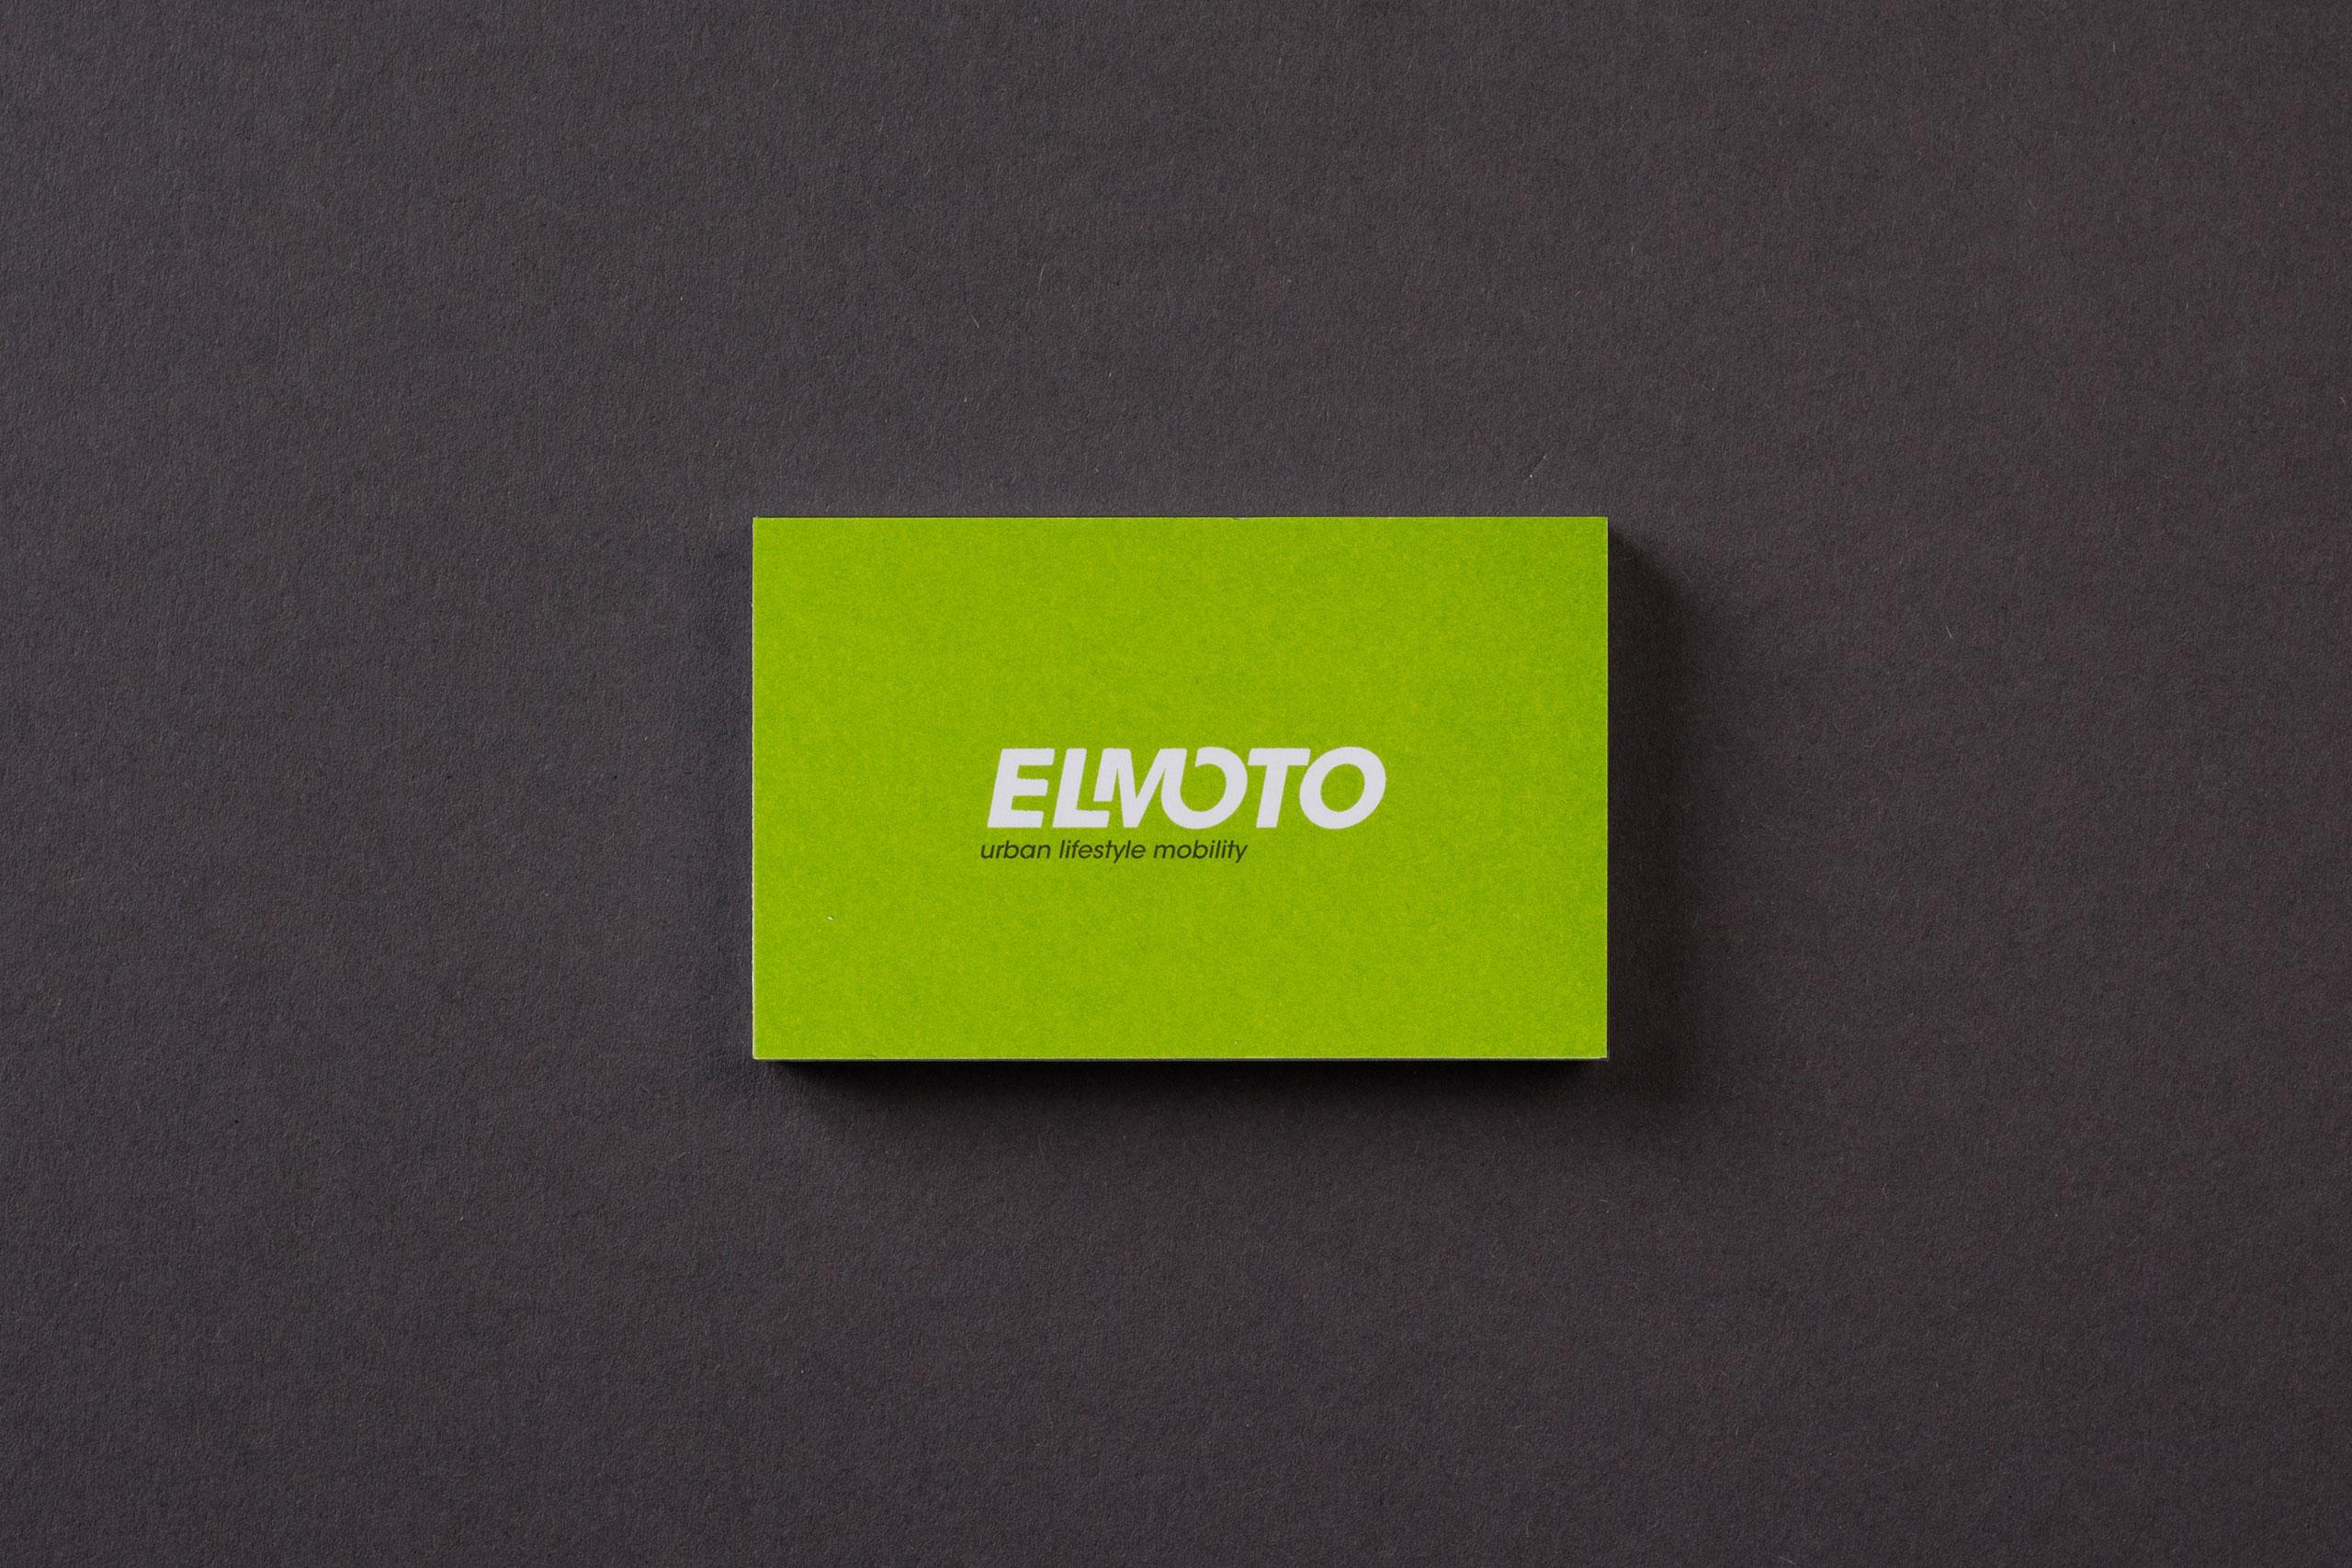 Elmoto 2